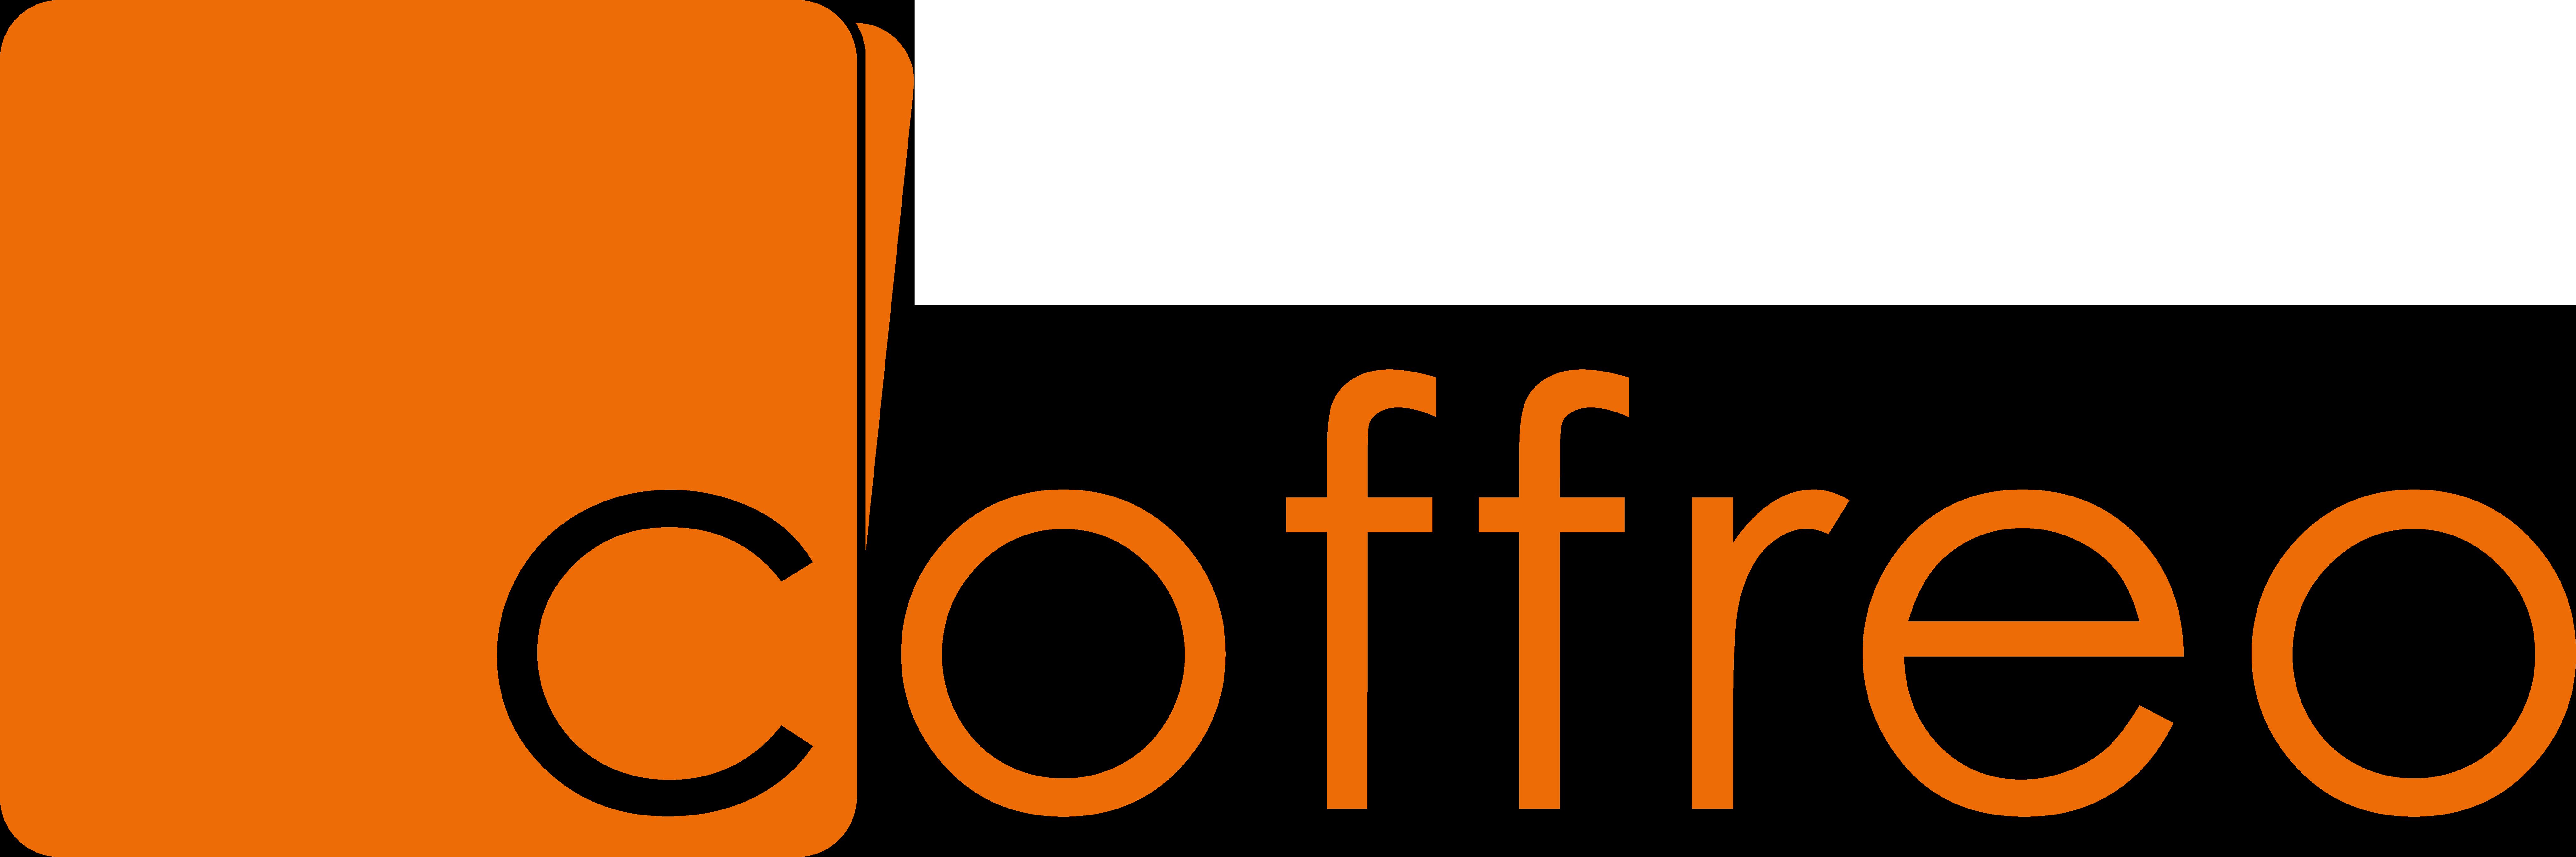 Coffreo